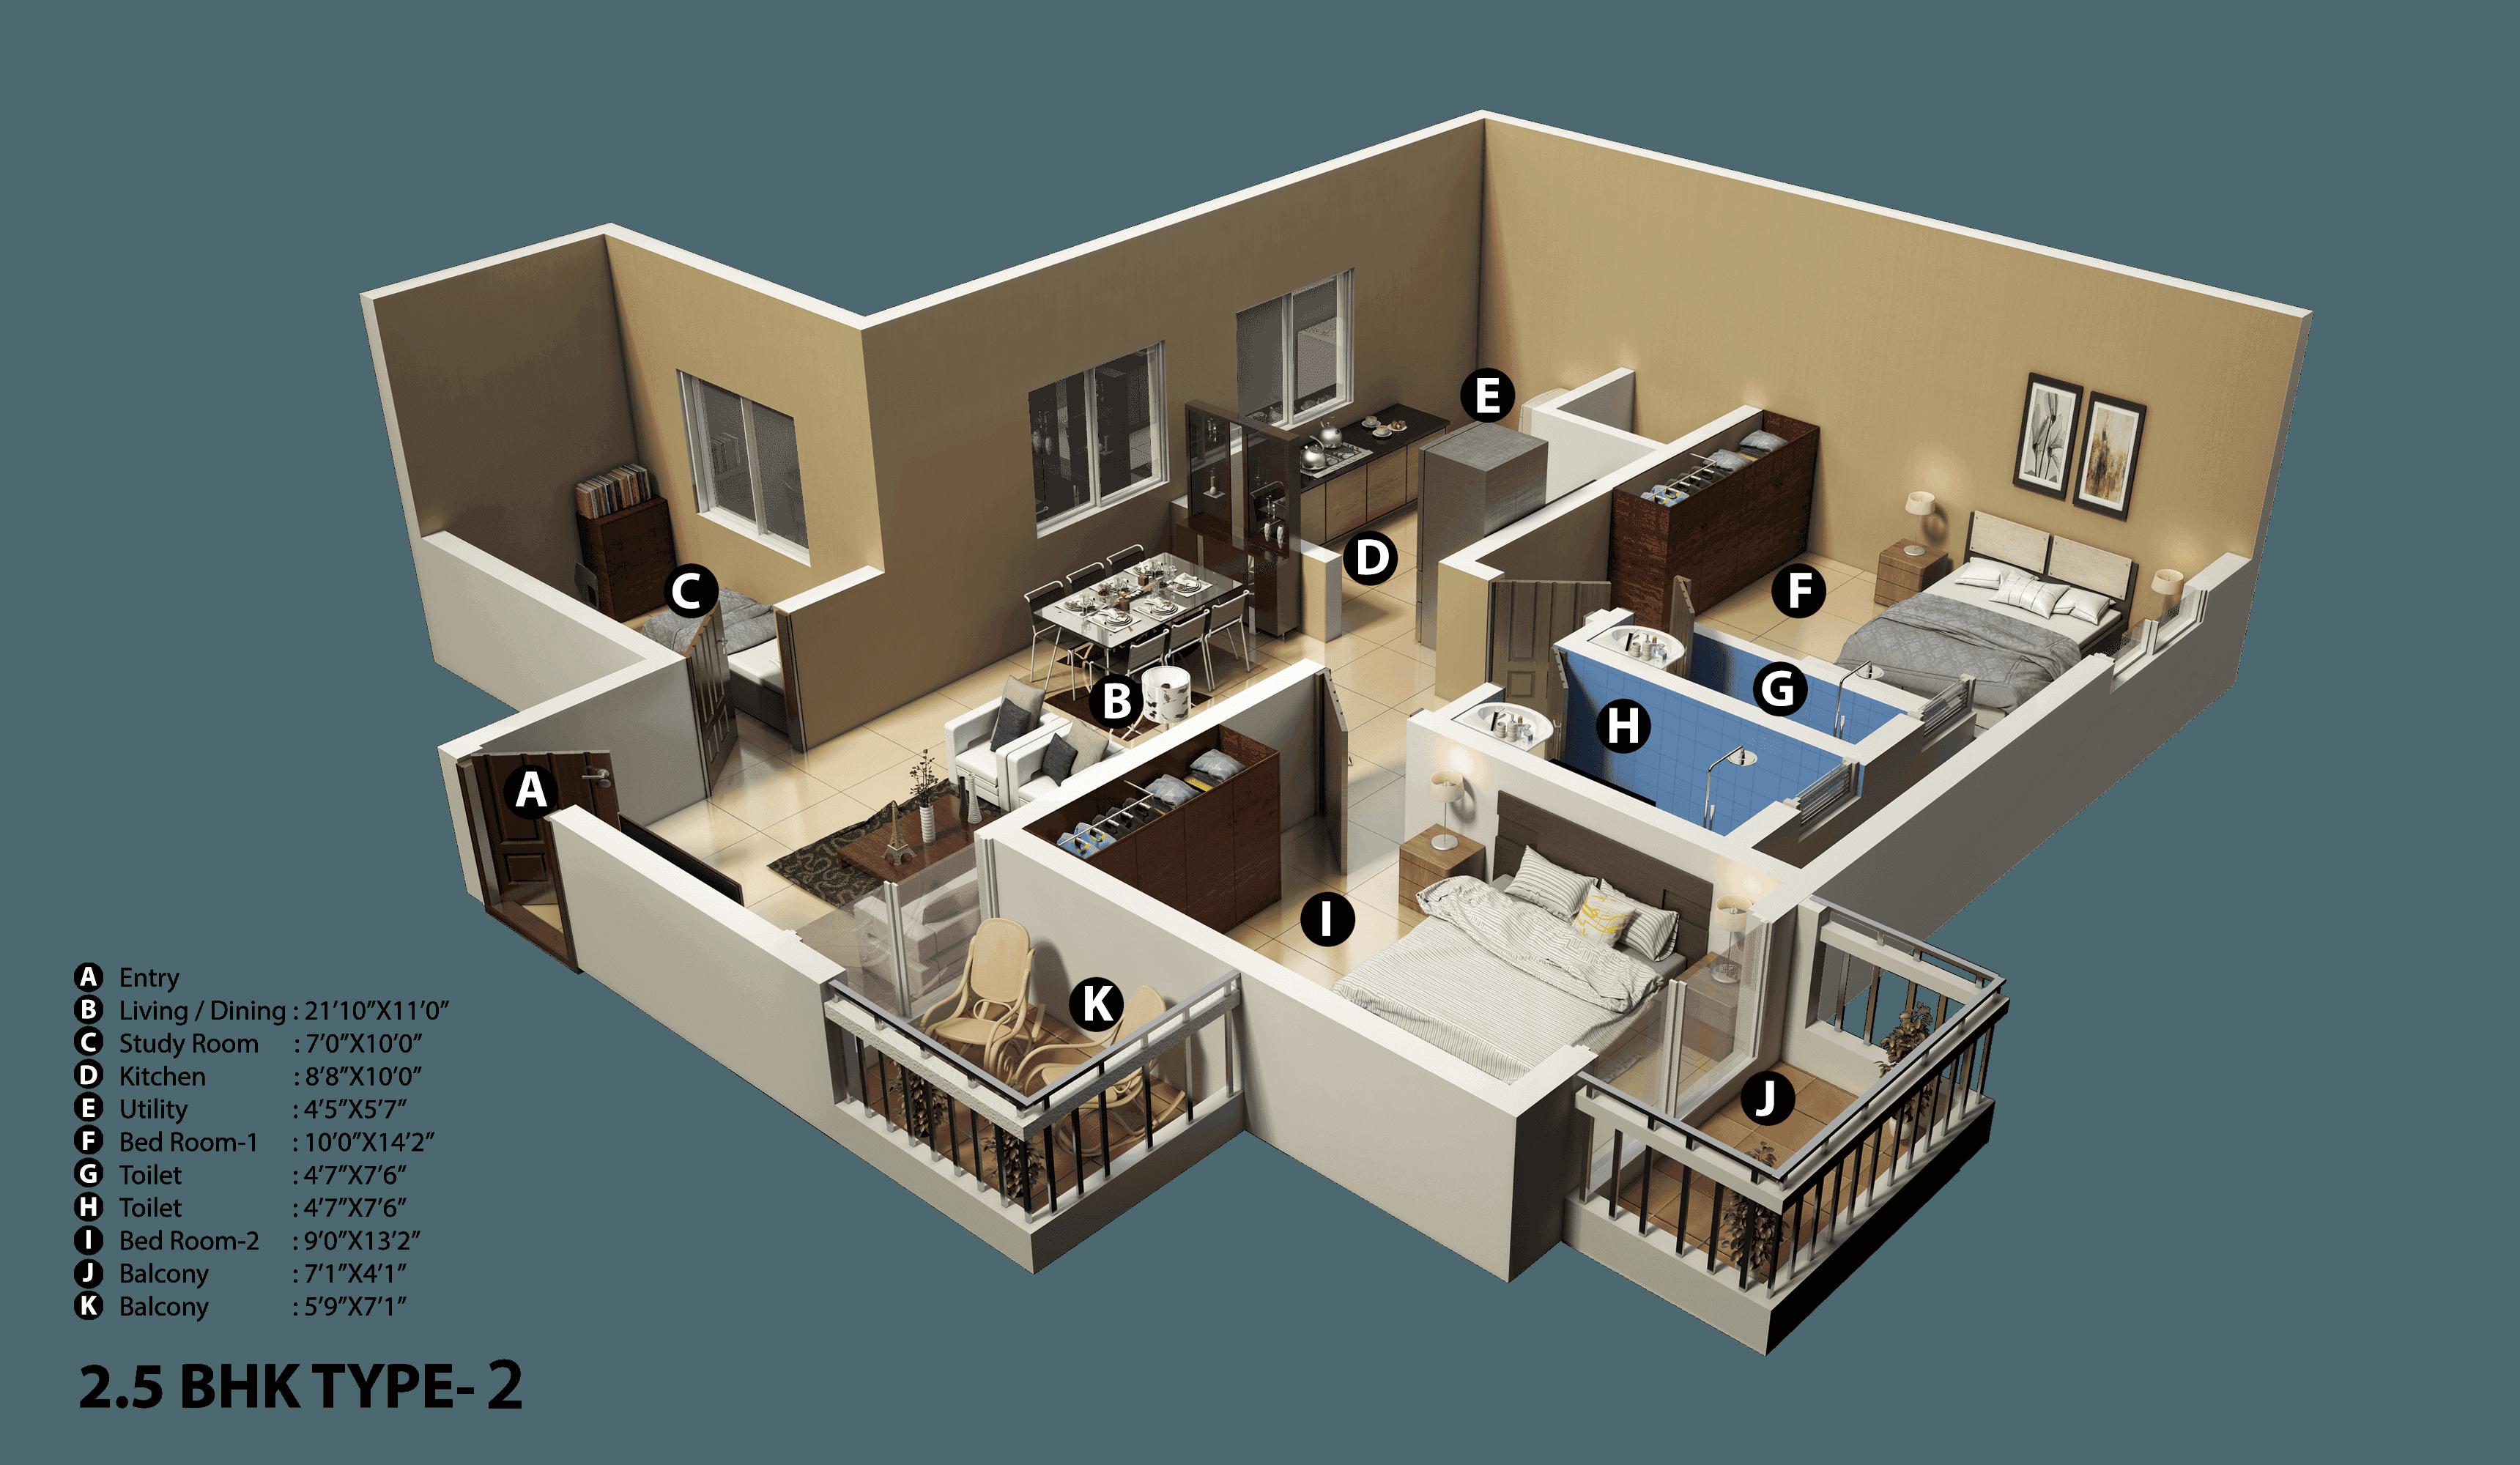 e5711390e8baf80757c2c7113d4e39bd Top Result 50 New 7 Bedroom House Plans Gallery 2017 Hgd6